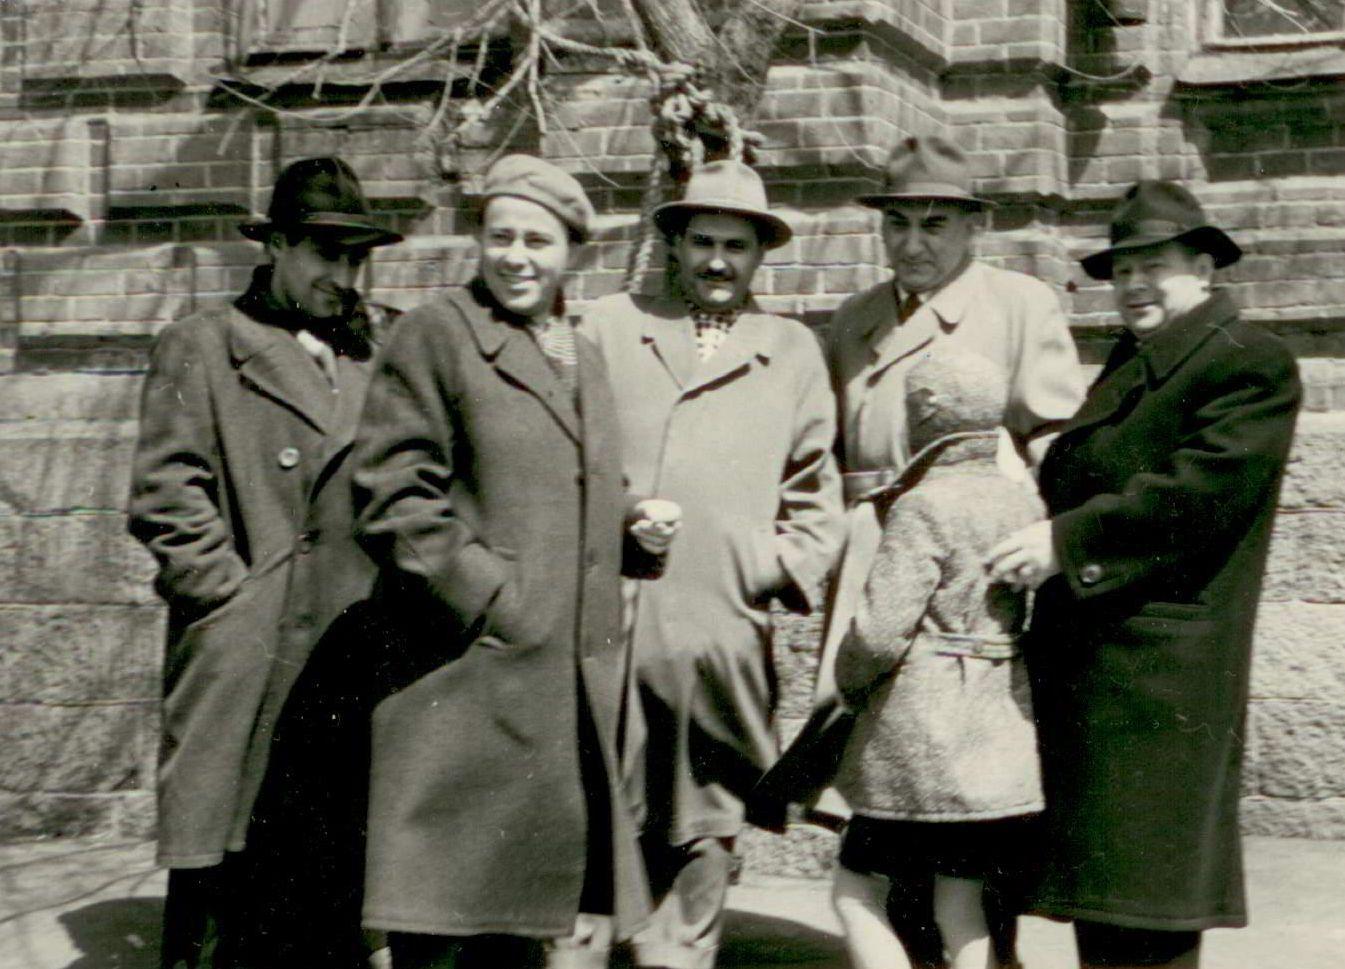 Малинский, Лисицкий, Сарахатунов, Сабуров, Борзунин. Хабаровск. 60-е годы